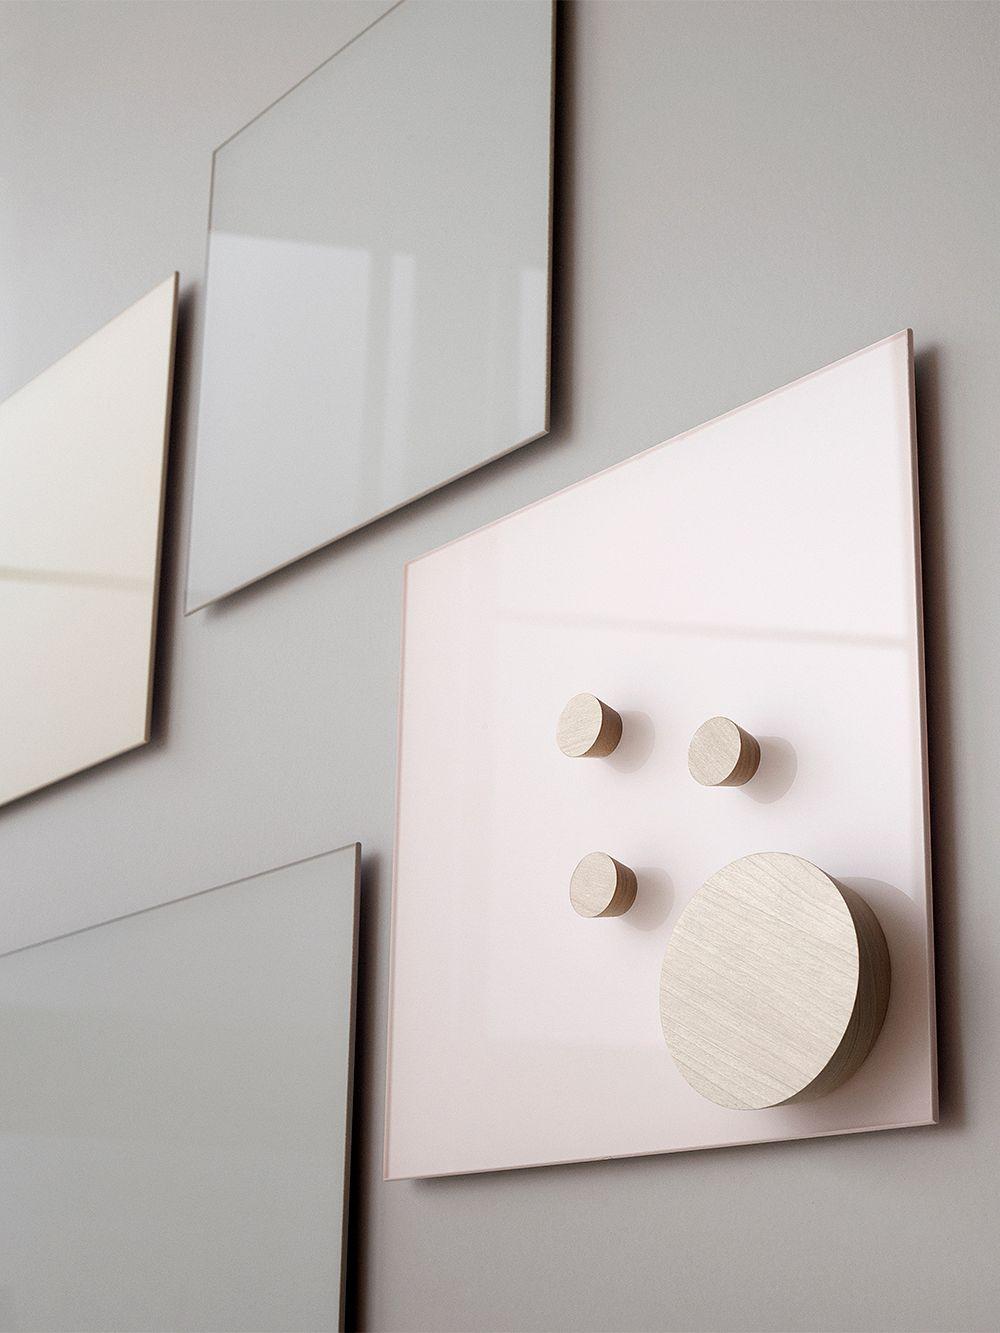 Lintex Mood Wall glassboard, 30 x 30 cm, pure